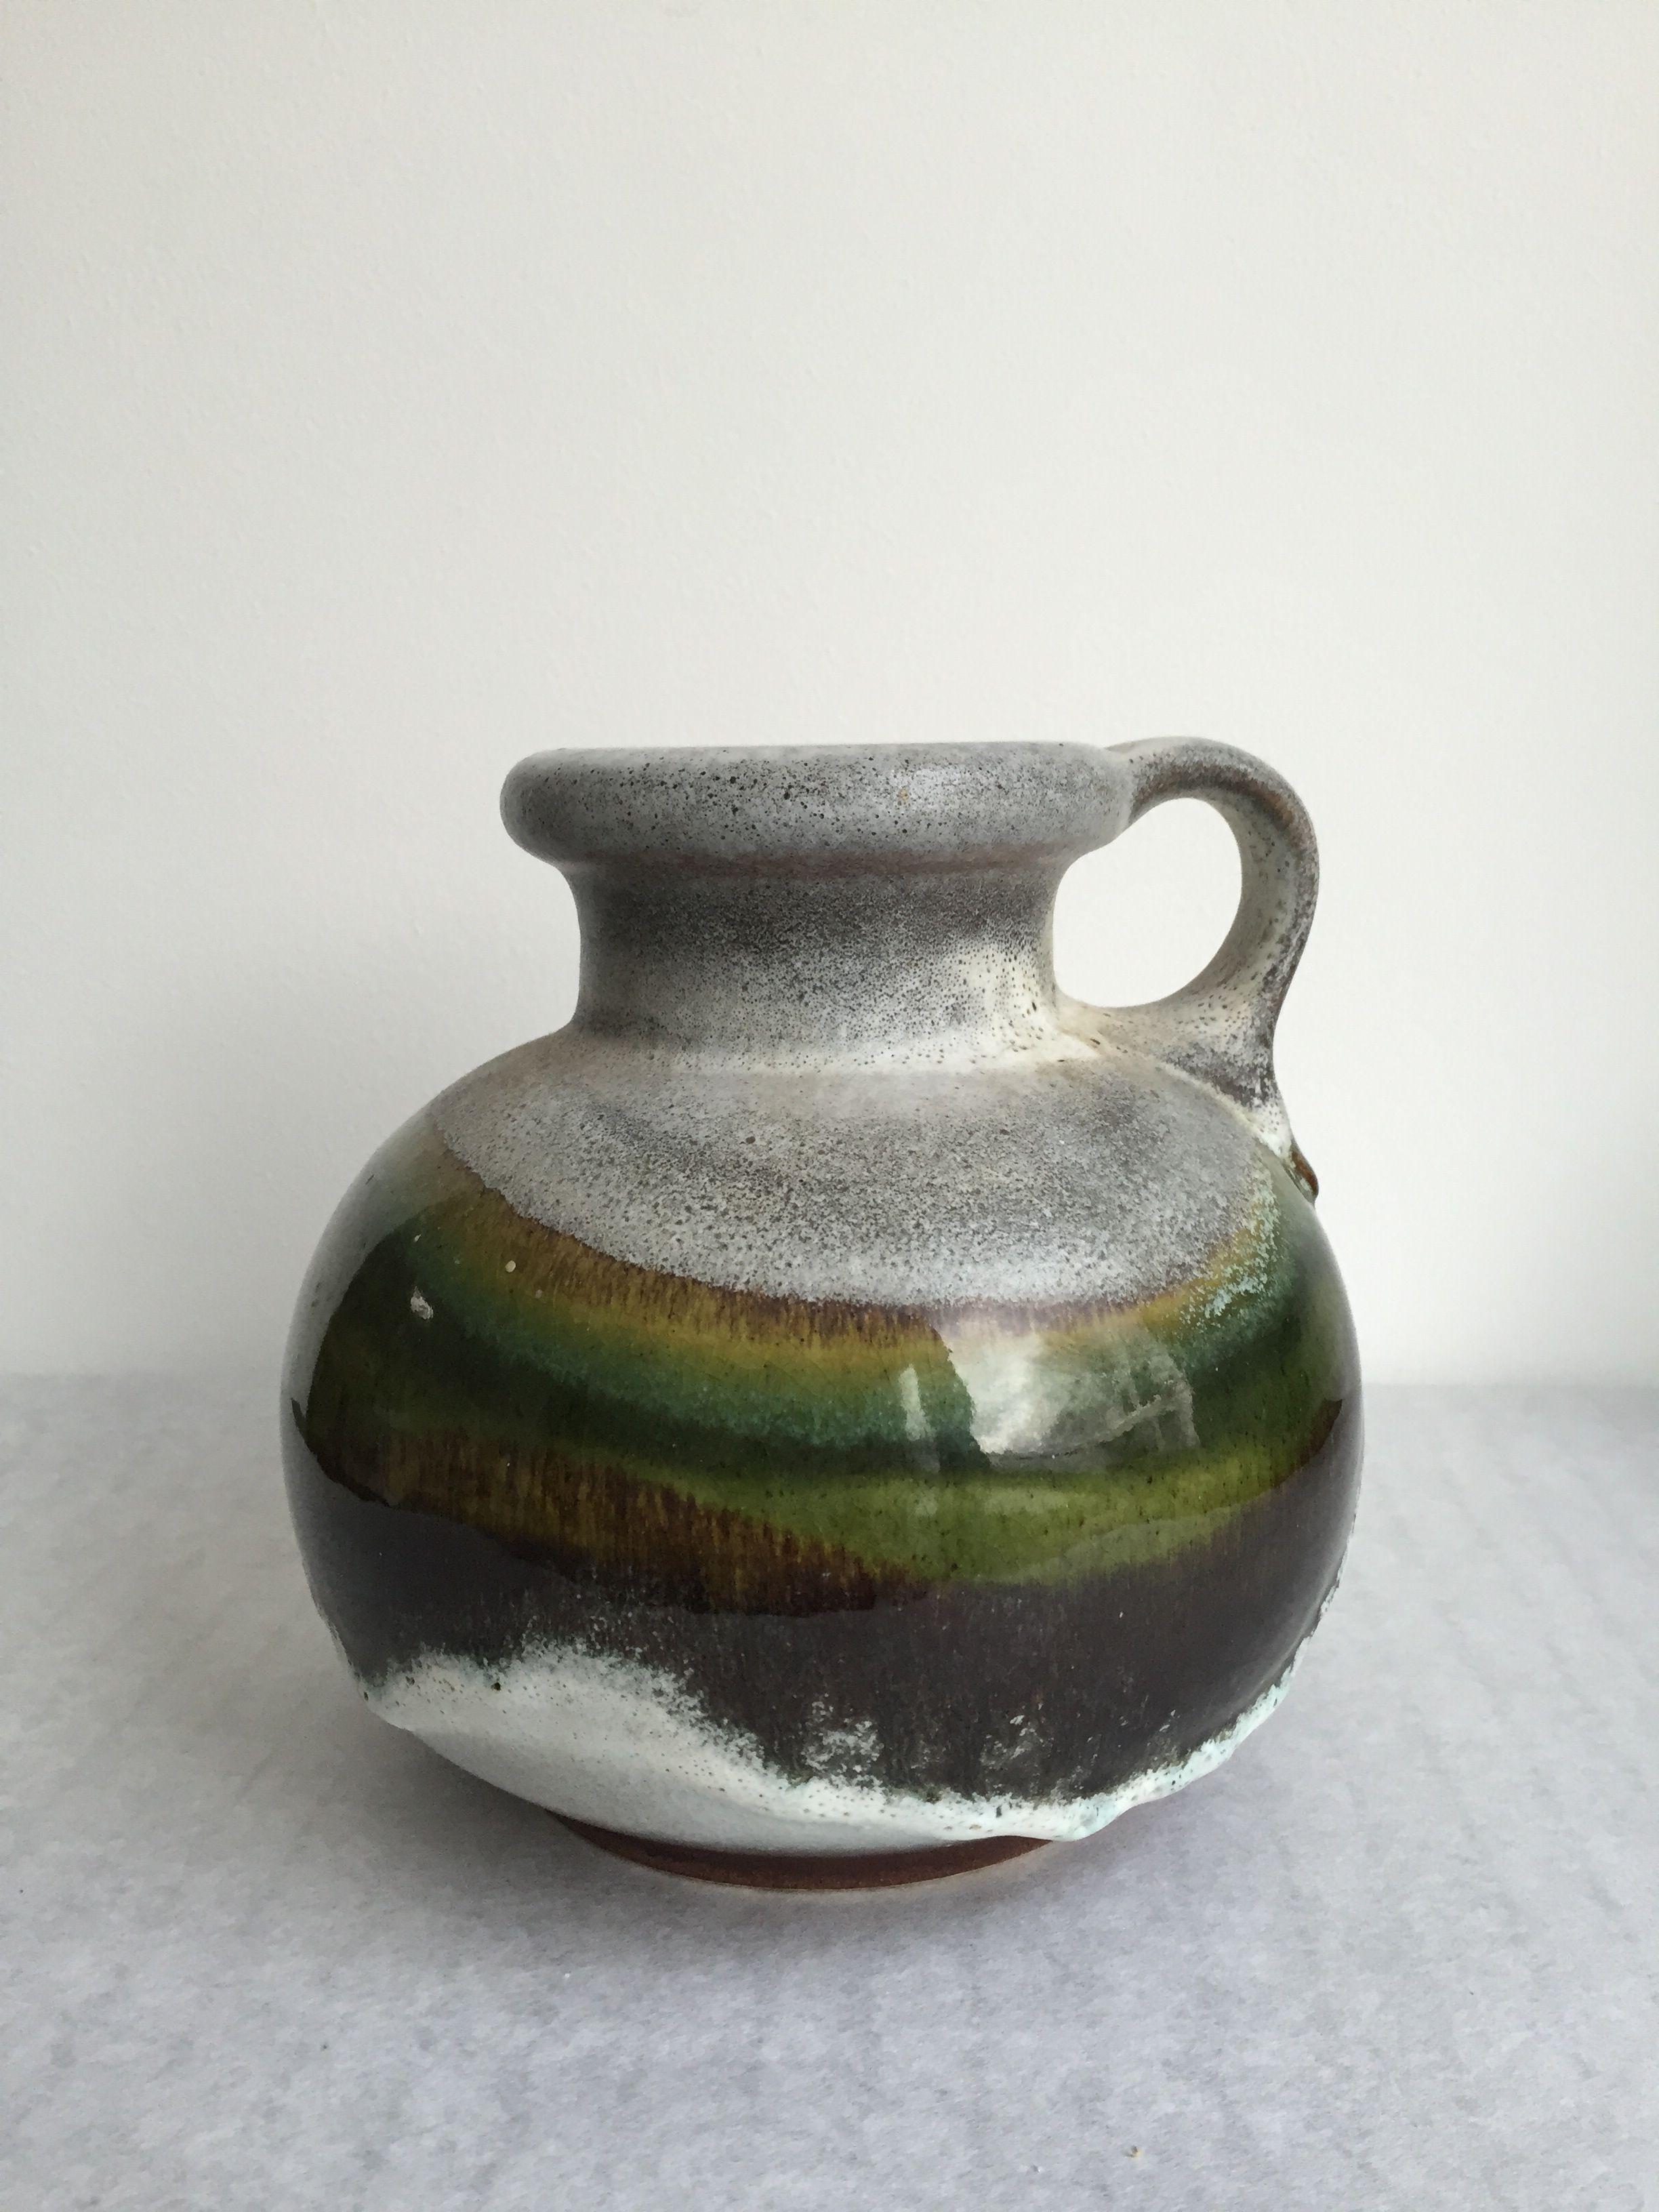 Pin On Mid Century Ceramic Vintage Vasen Vasen West Germany Studio Keramik